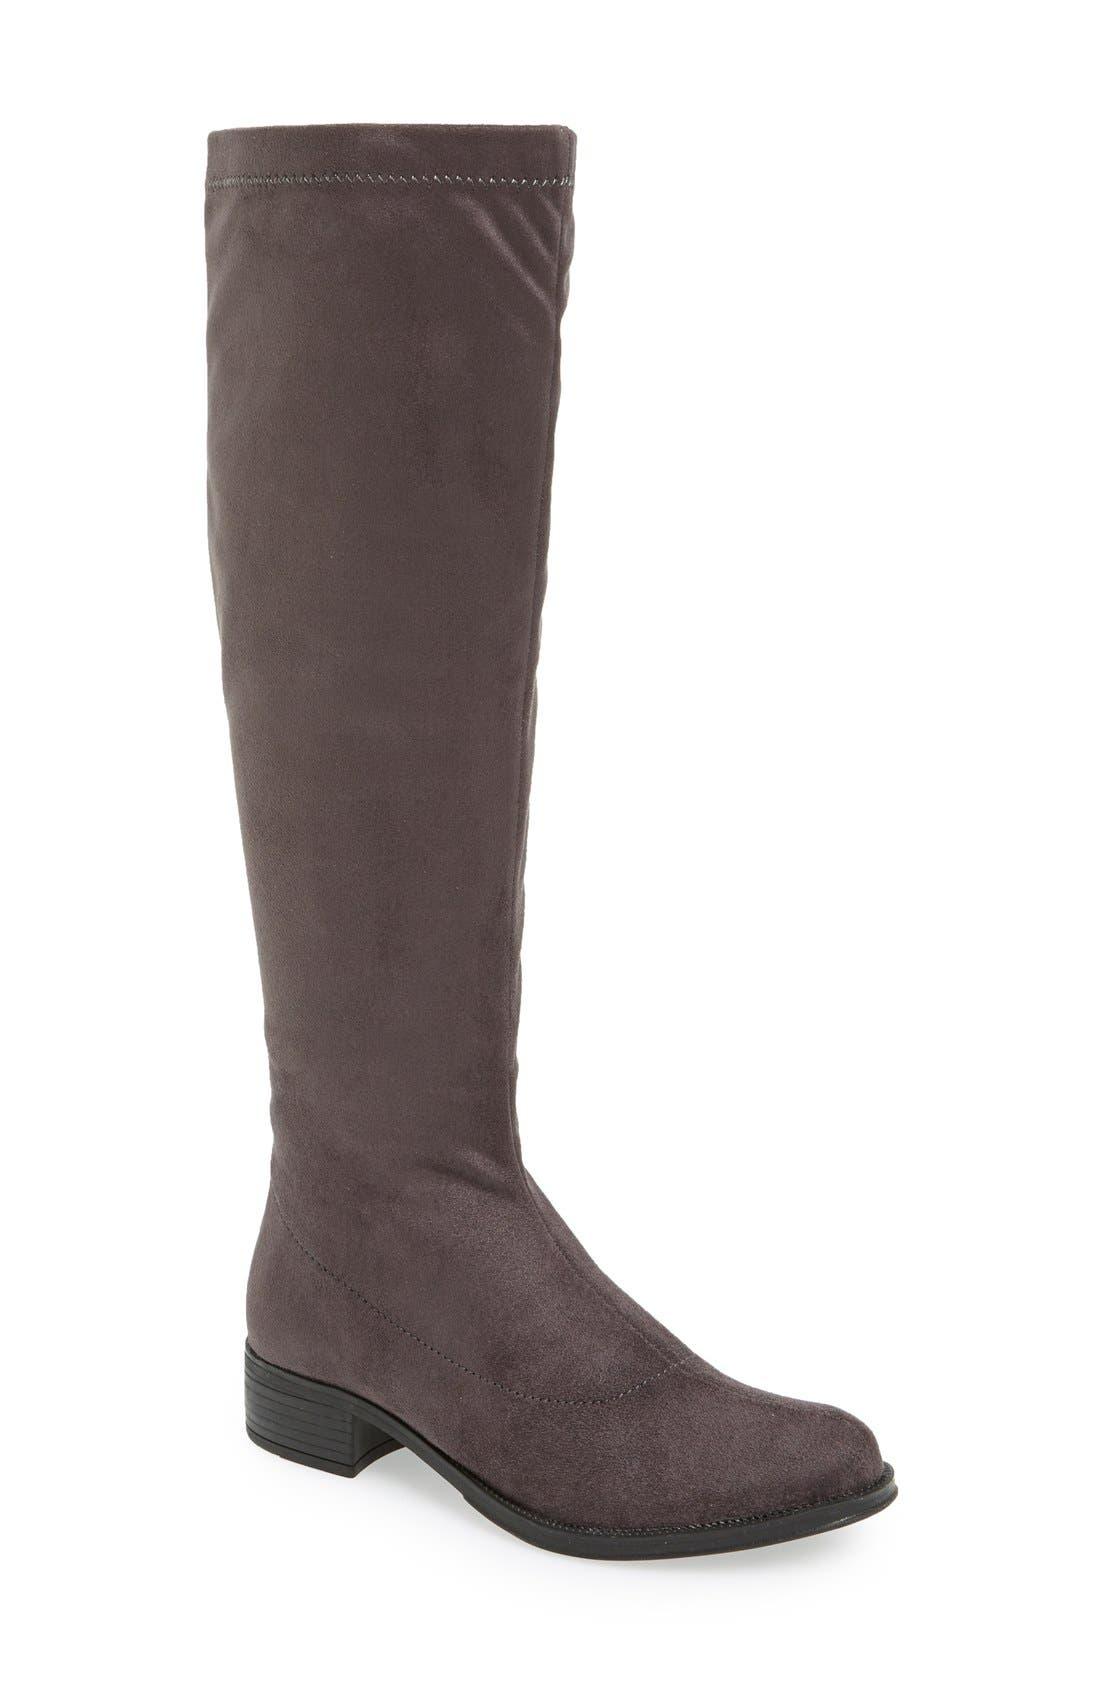 Alternate Image 1 Selected - Bussola 'Sofia' Tall Boot (Women)